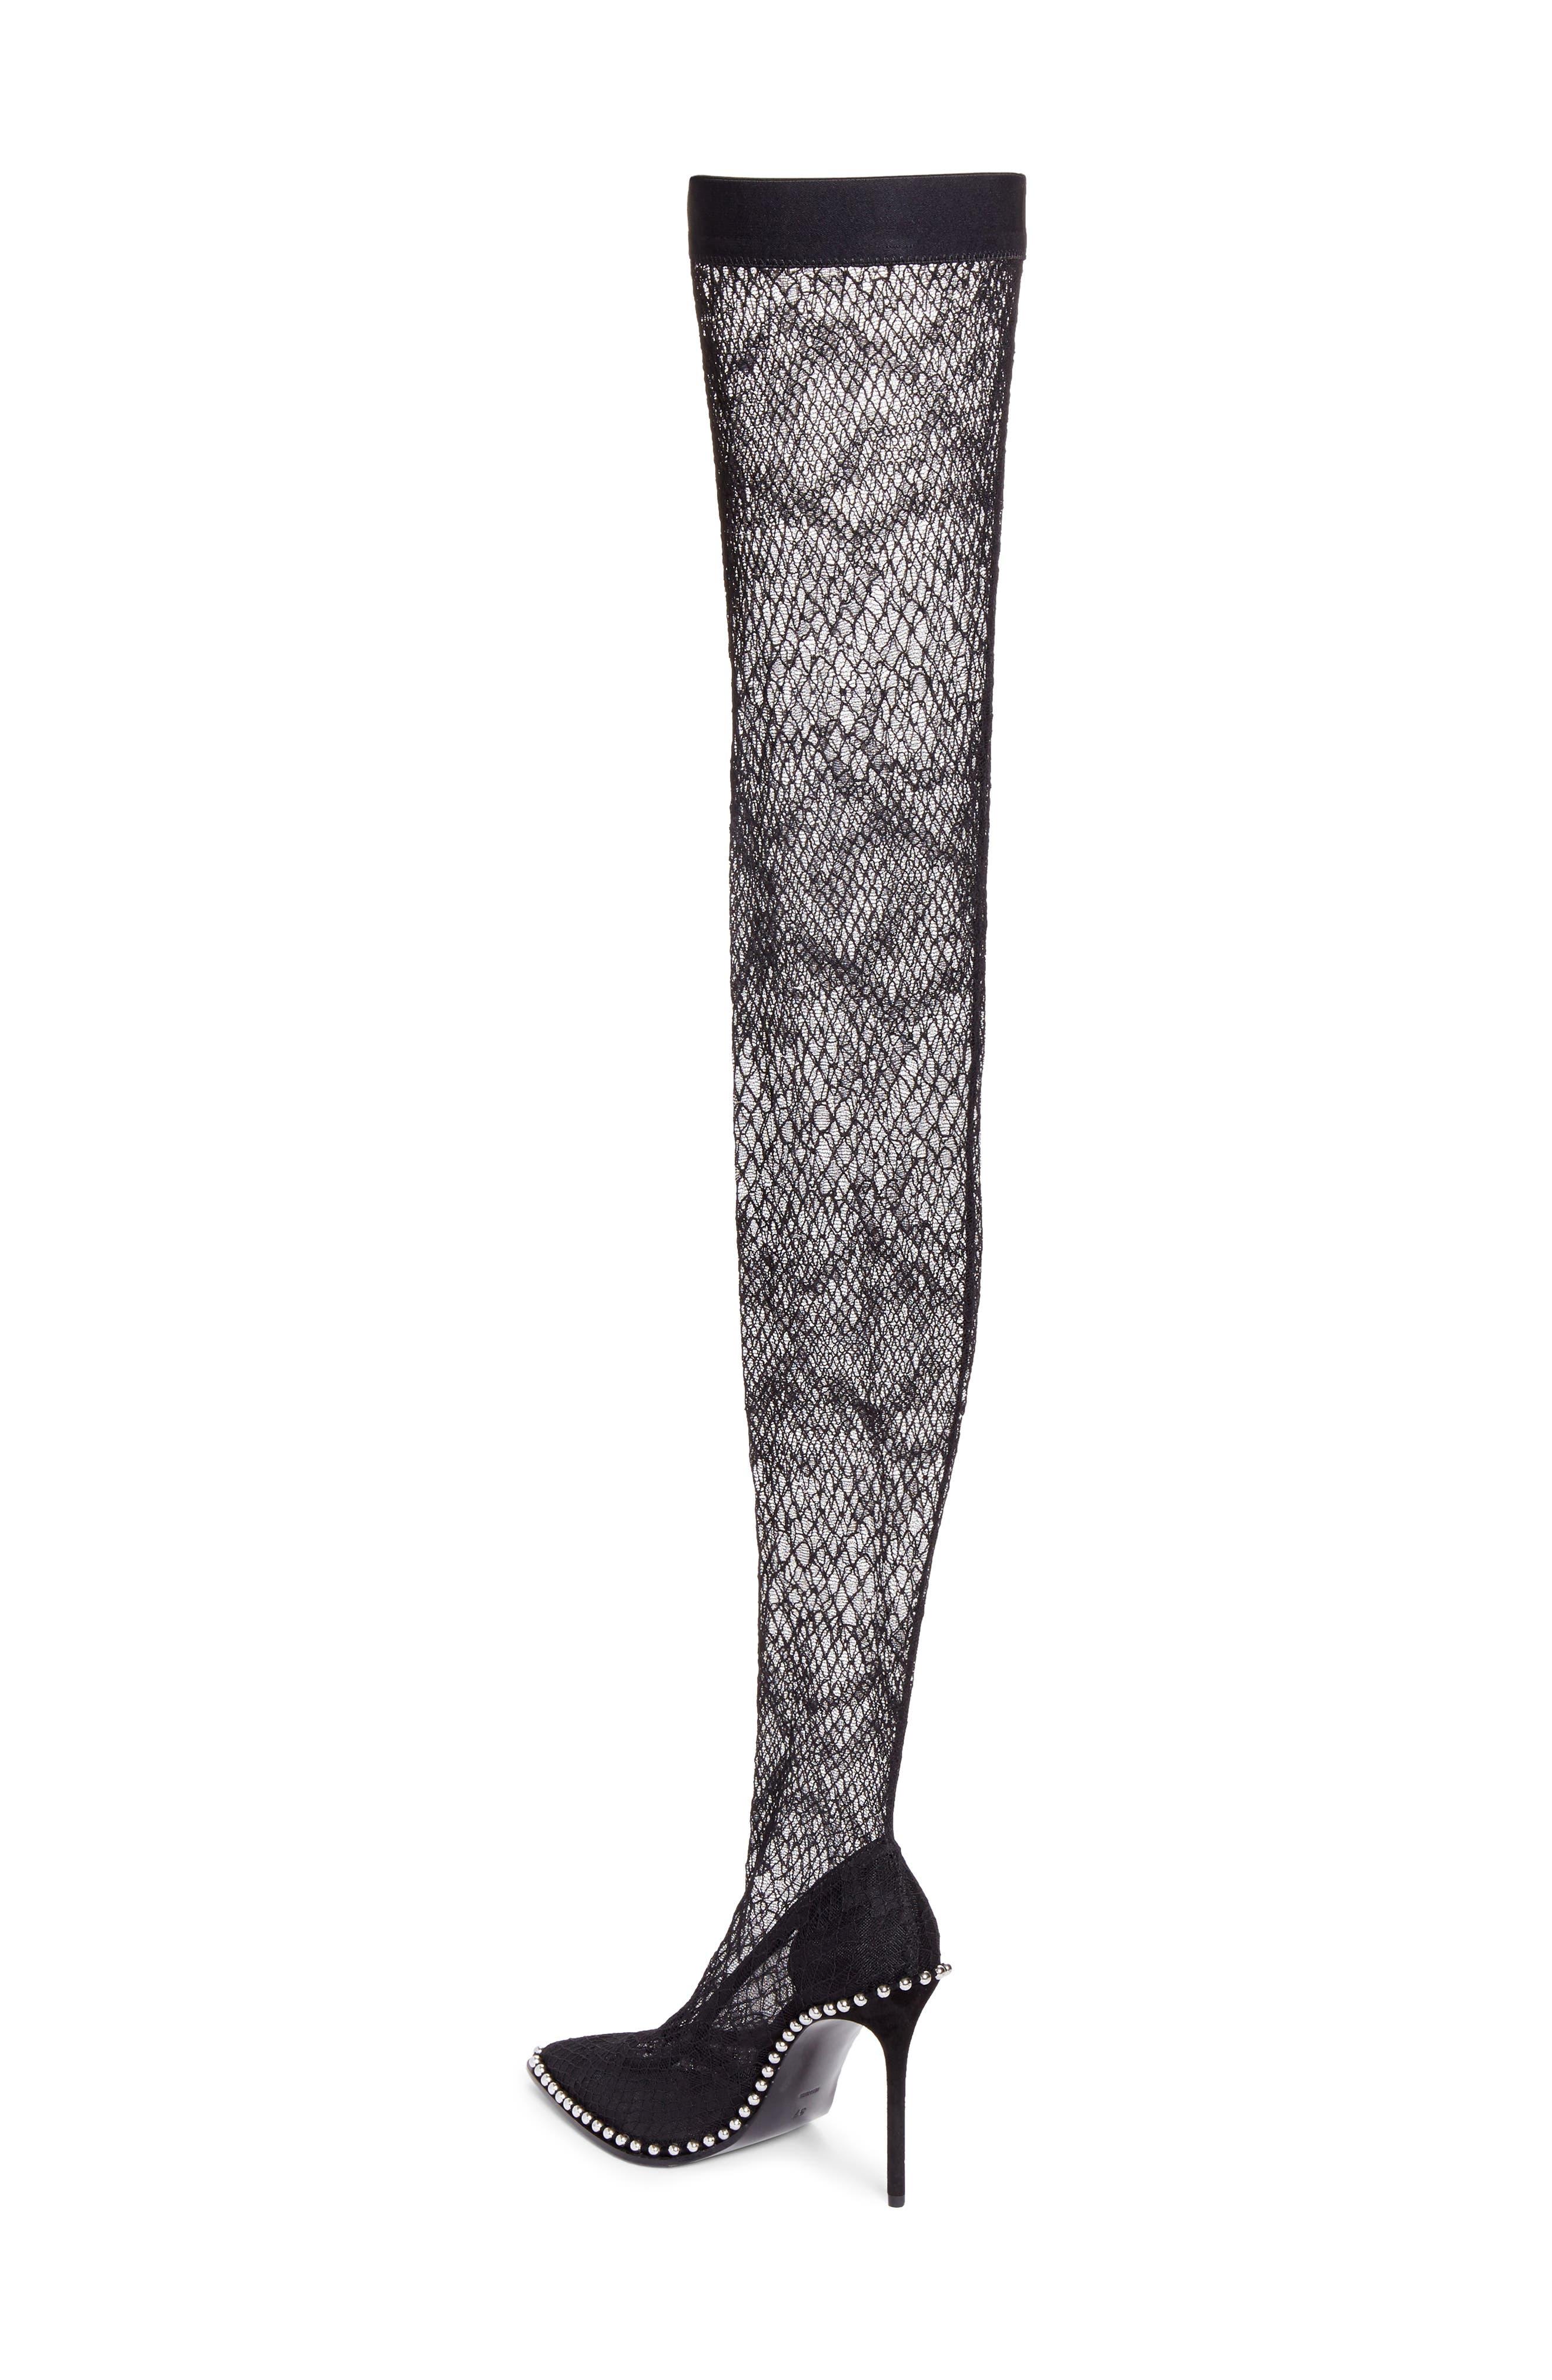 Lyra Thigh-High Fishnet Stocking Pump,                             Alternate thumbnail 2, color,                             001